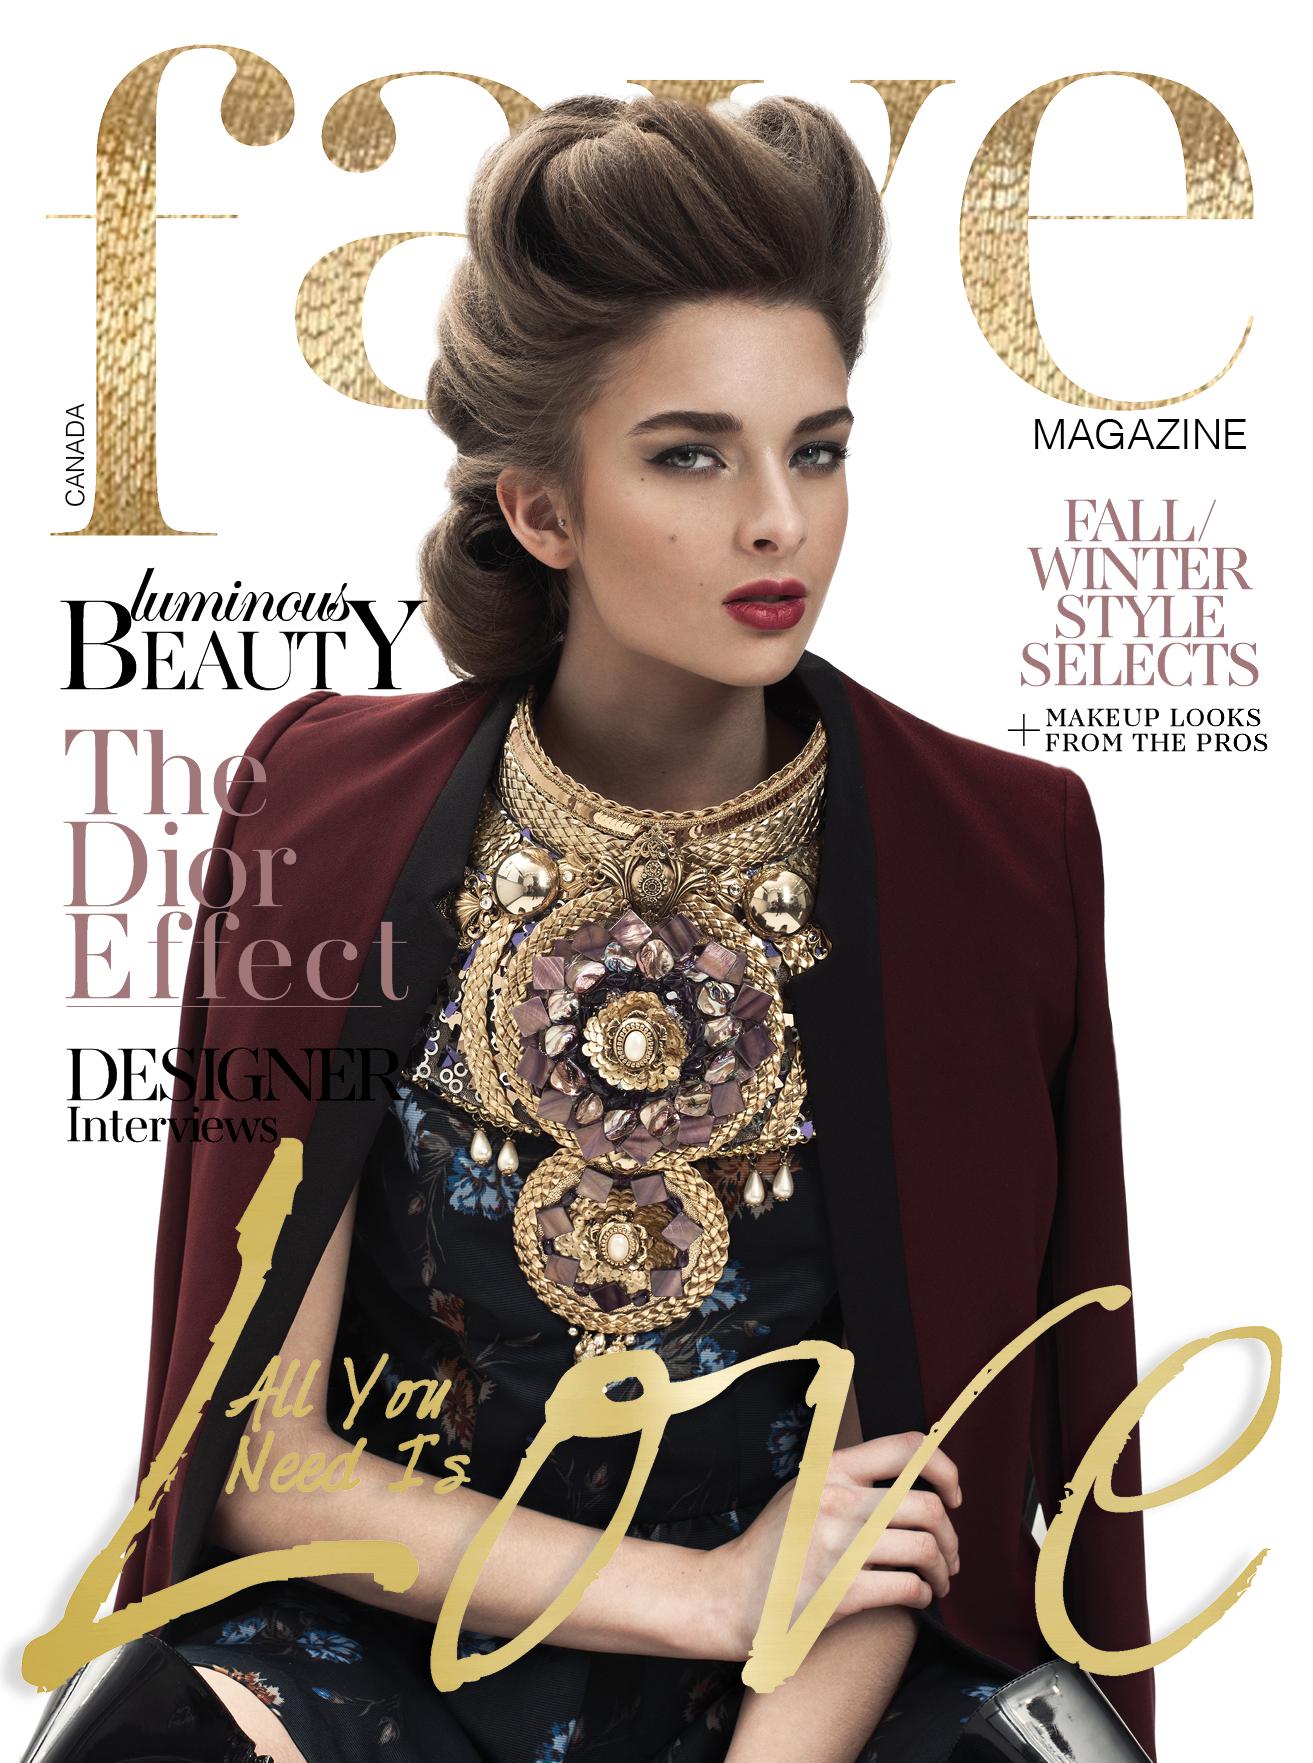 fave Magazine F/W 2015-16